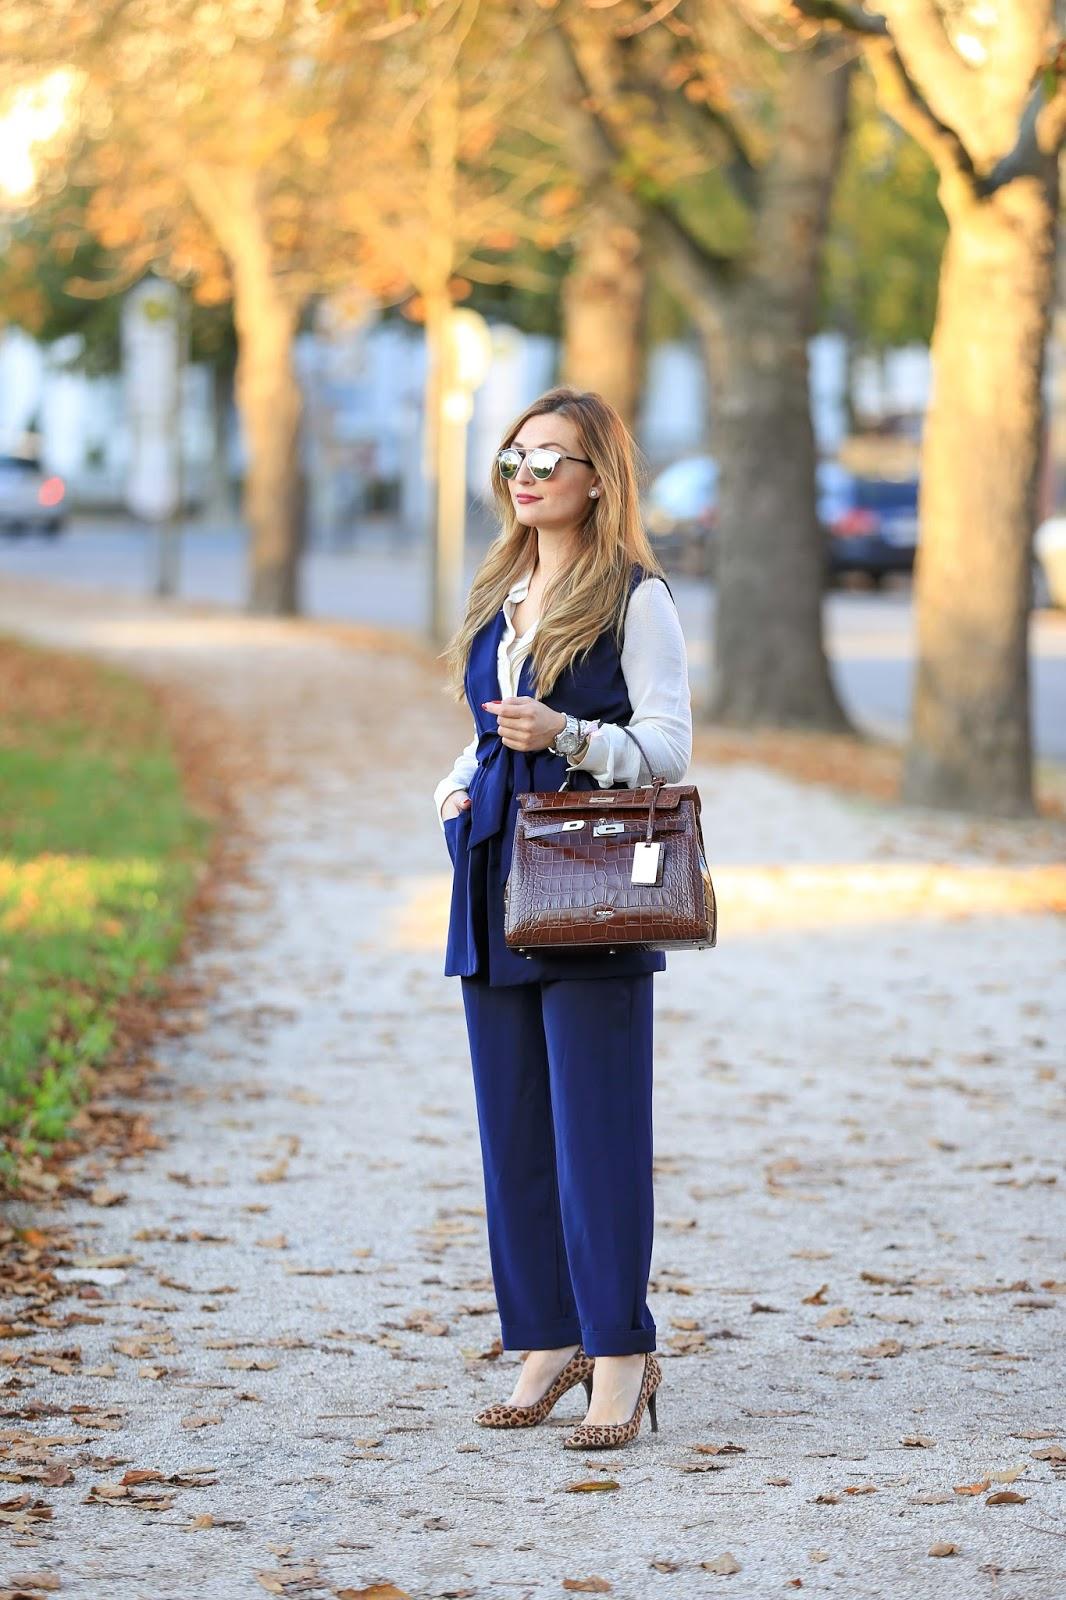 Blogger-Fashionblogger-Streetsylelook-Streetstyleblogger-Fashionstylebyjohanna-Olivia Palermo Style -Business look- Casual Look- Chic Look -Picard Tasche -Tasche Kroko-Kroko Tasche -